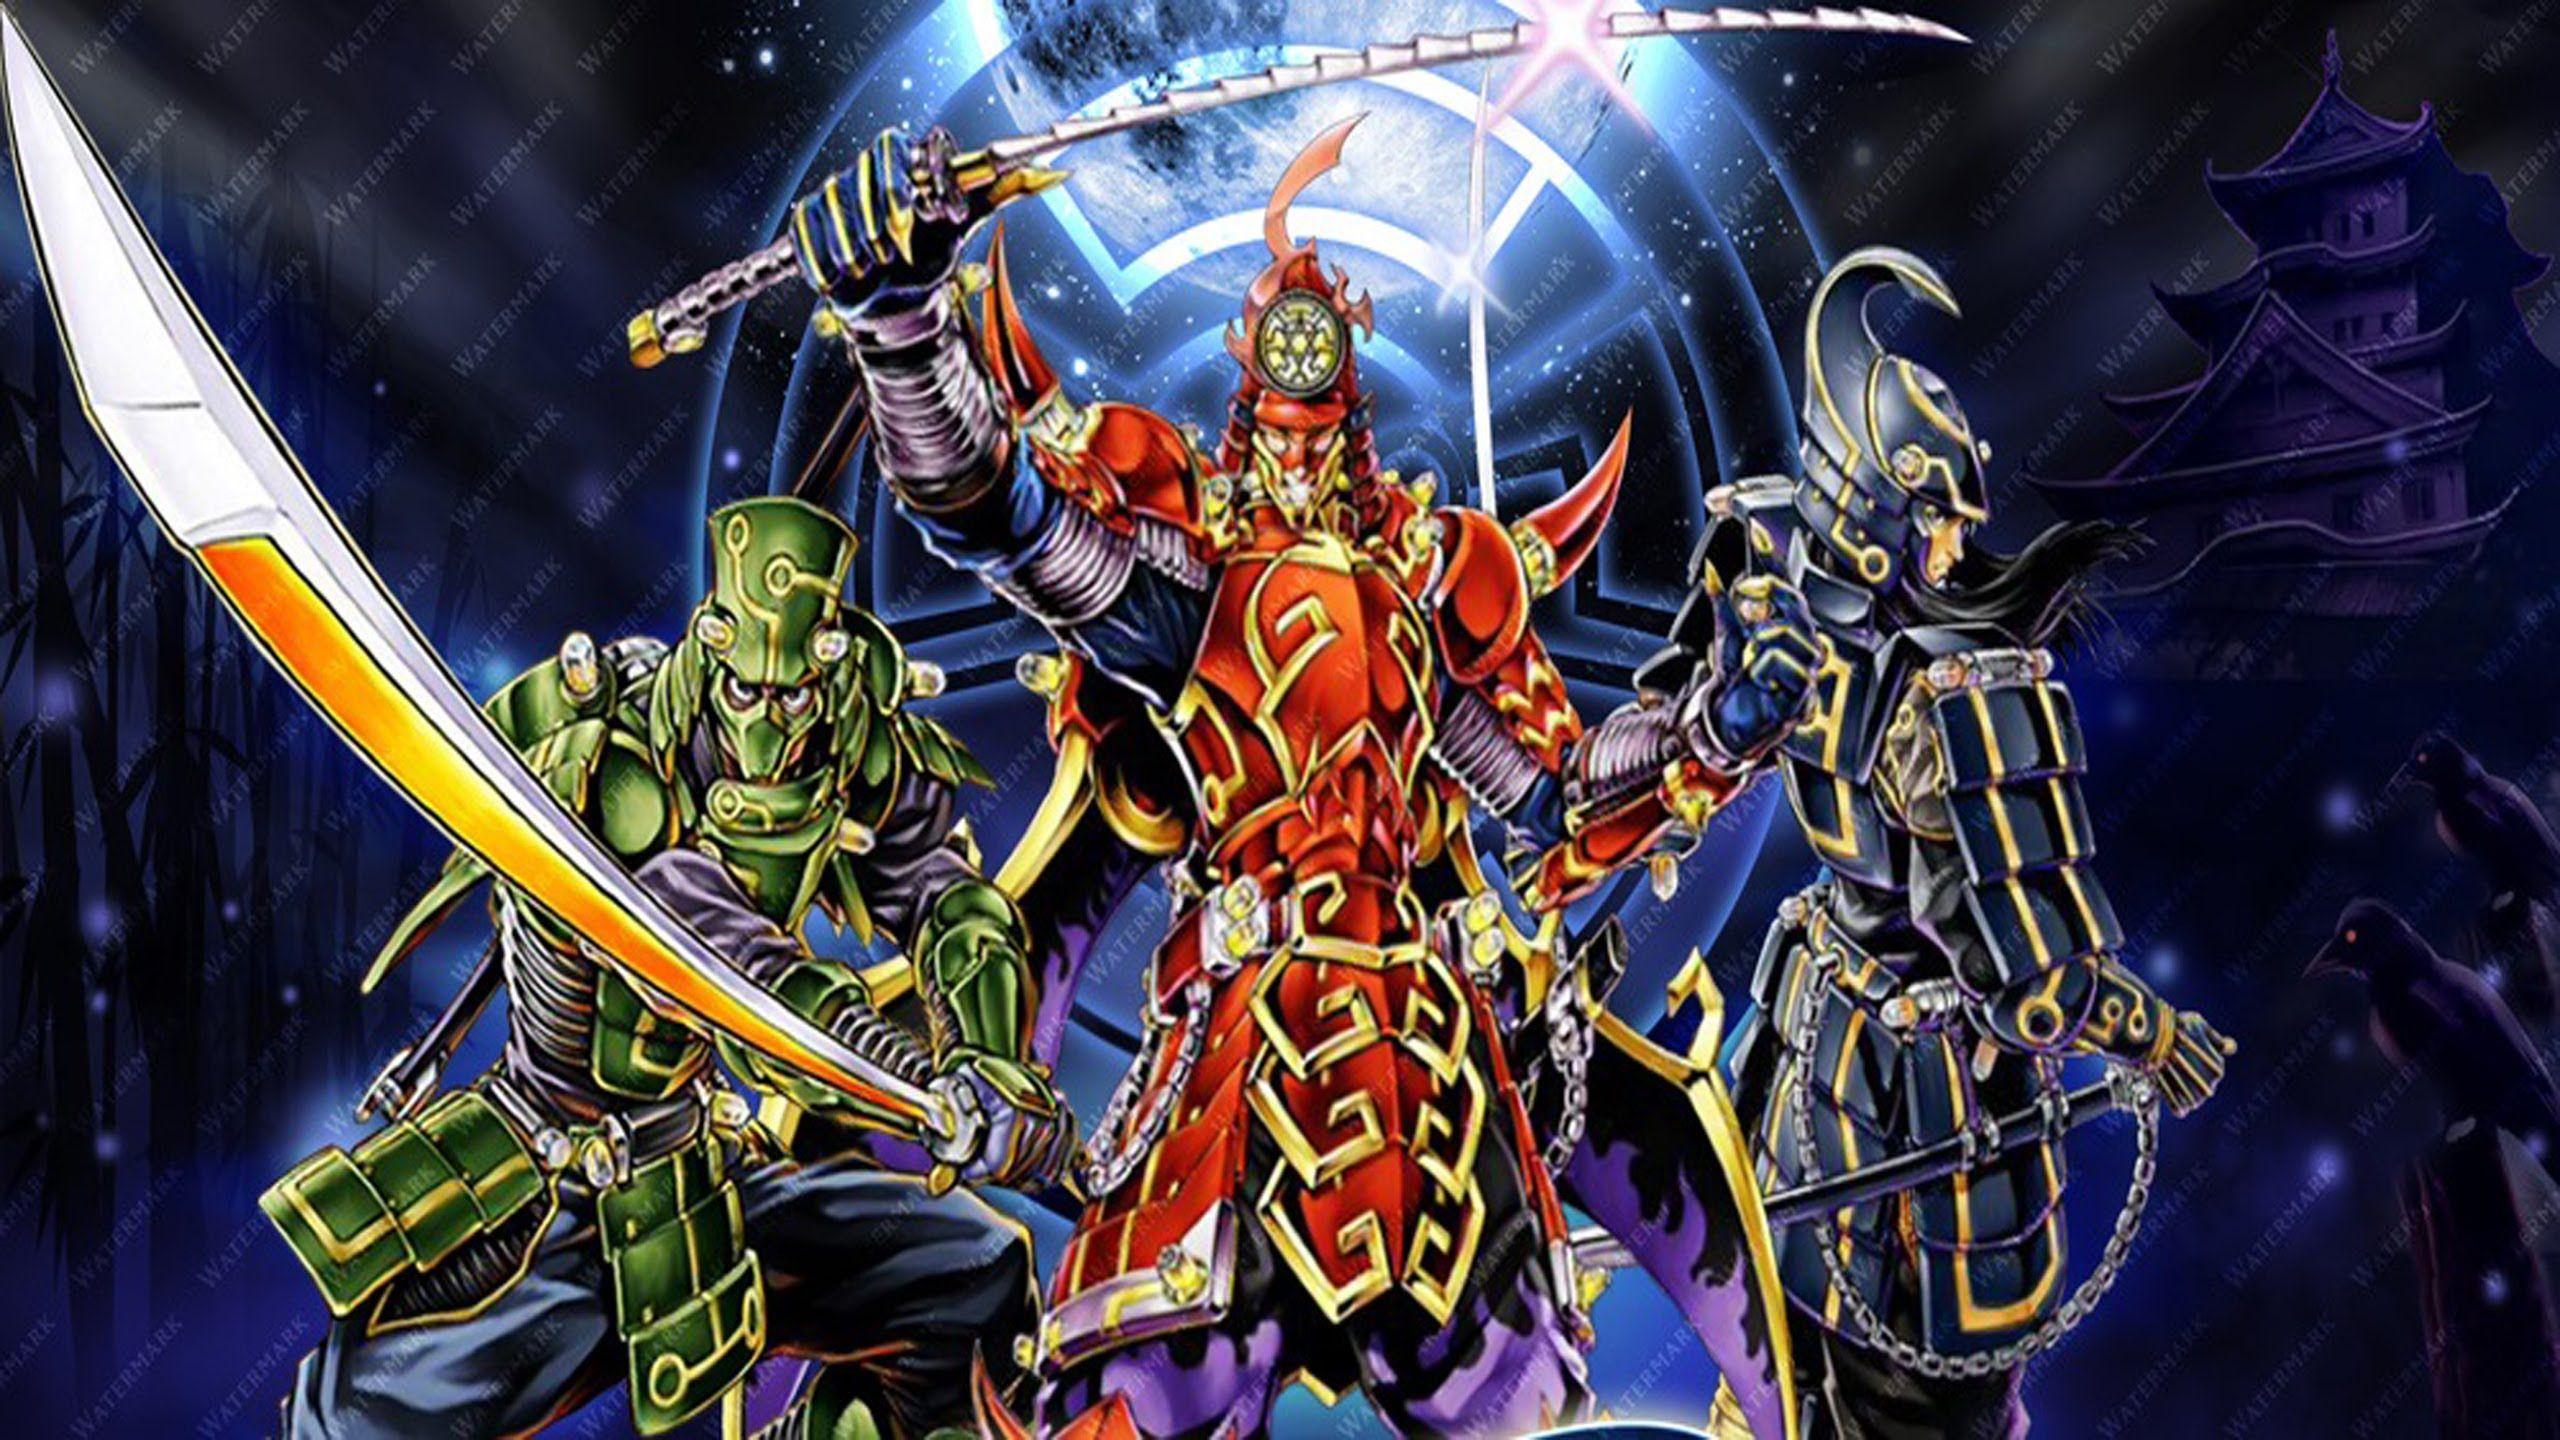 Six Samurai Wallpapers Top Free Six Samurai Backgrounds